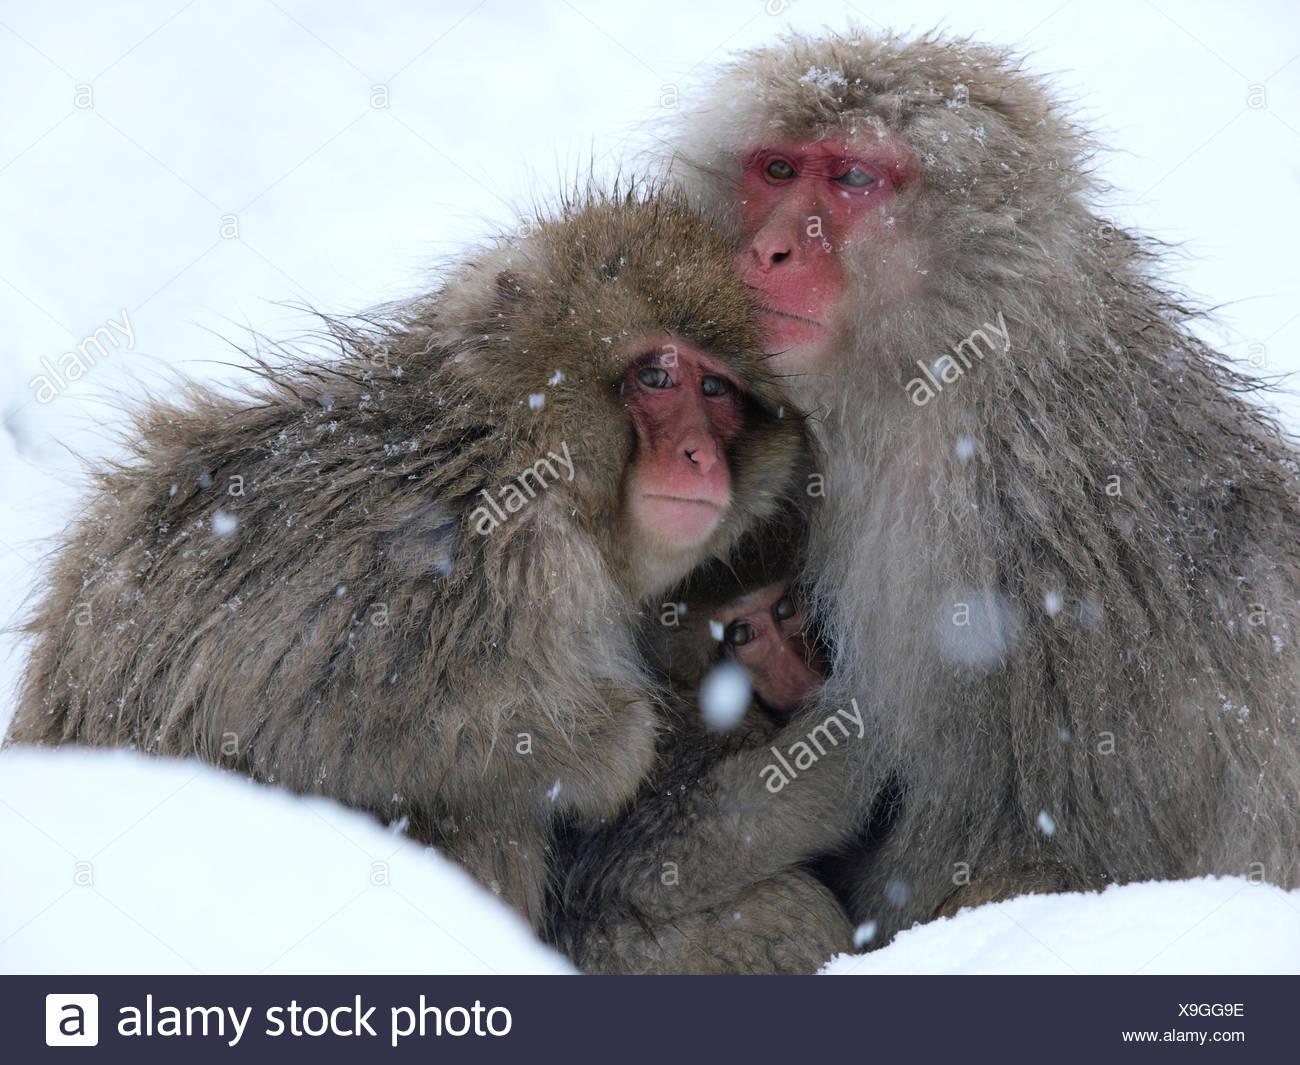 Japanese macaque (Macaca fuscata) family huddled together for warmth on a cold day, Jigokudani, Joshinetsu Kogen NP, Nagano, Japan - Stock Image